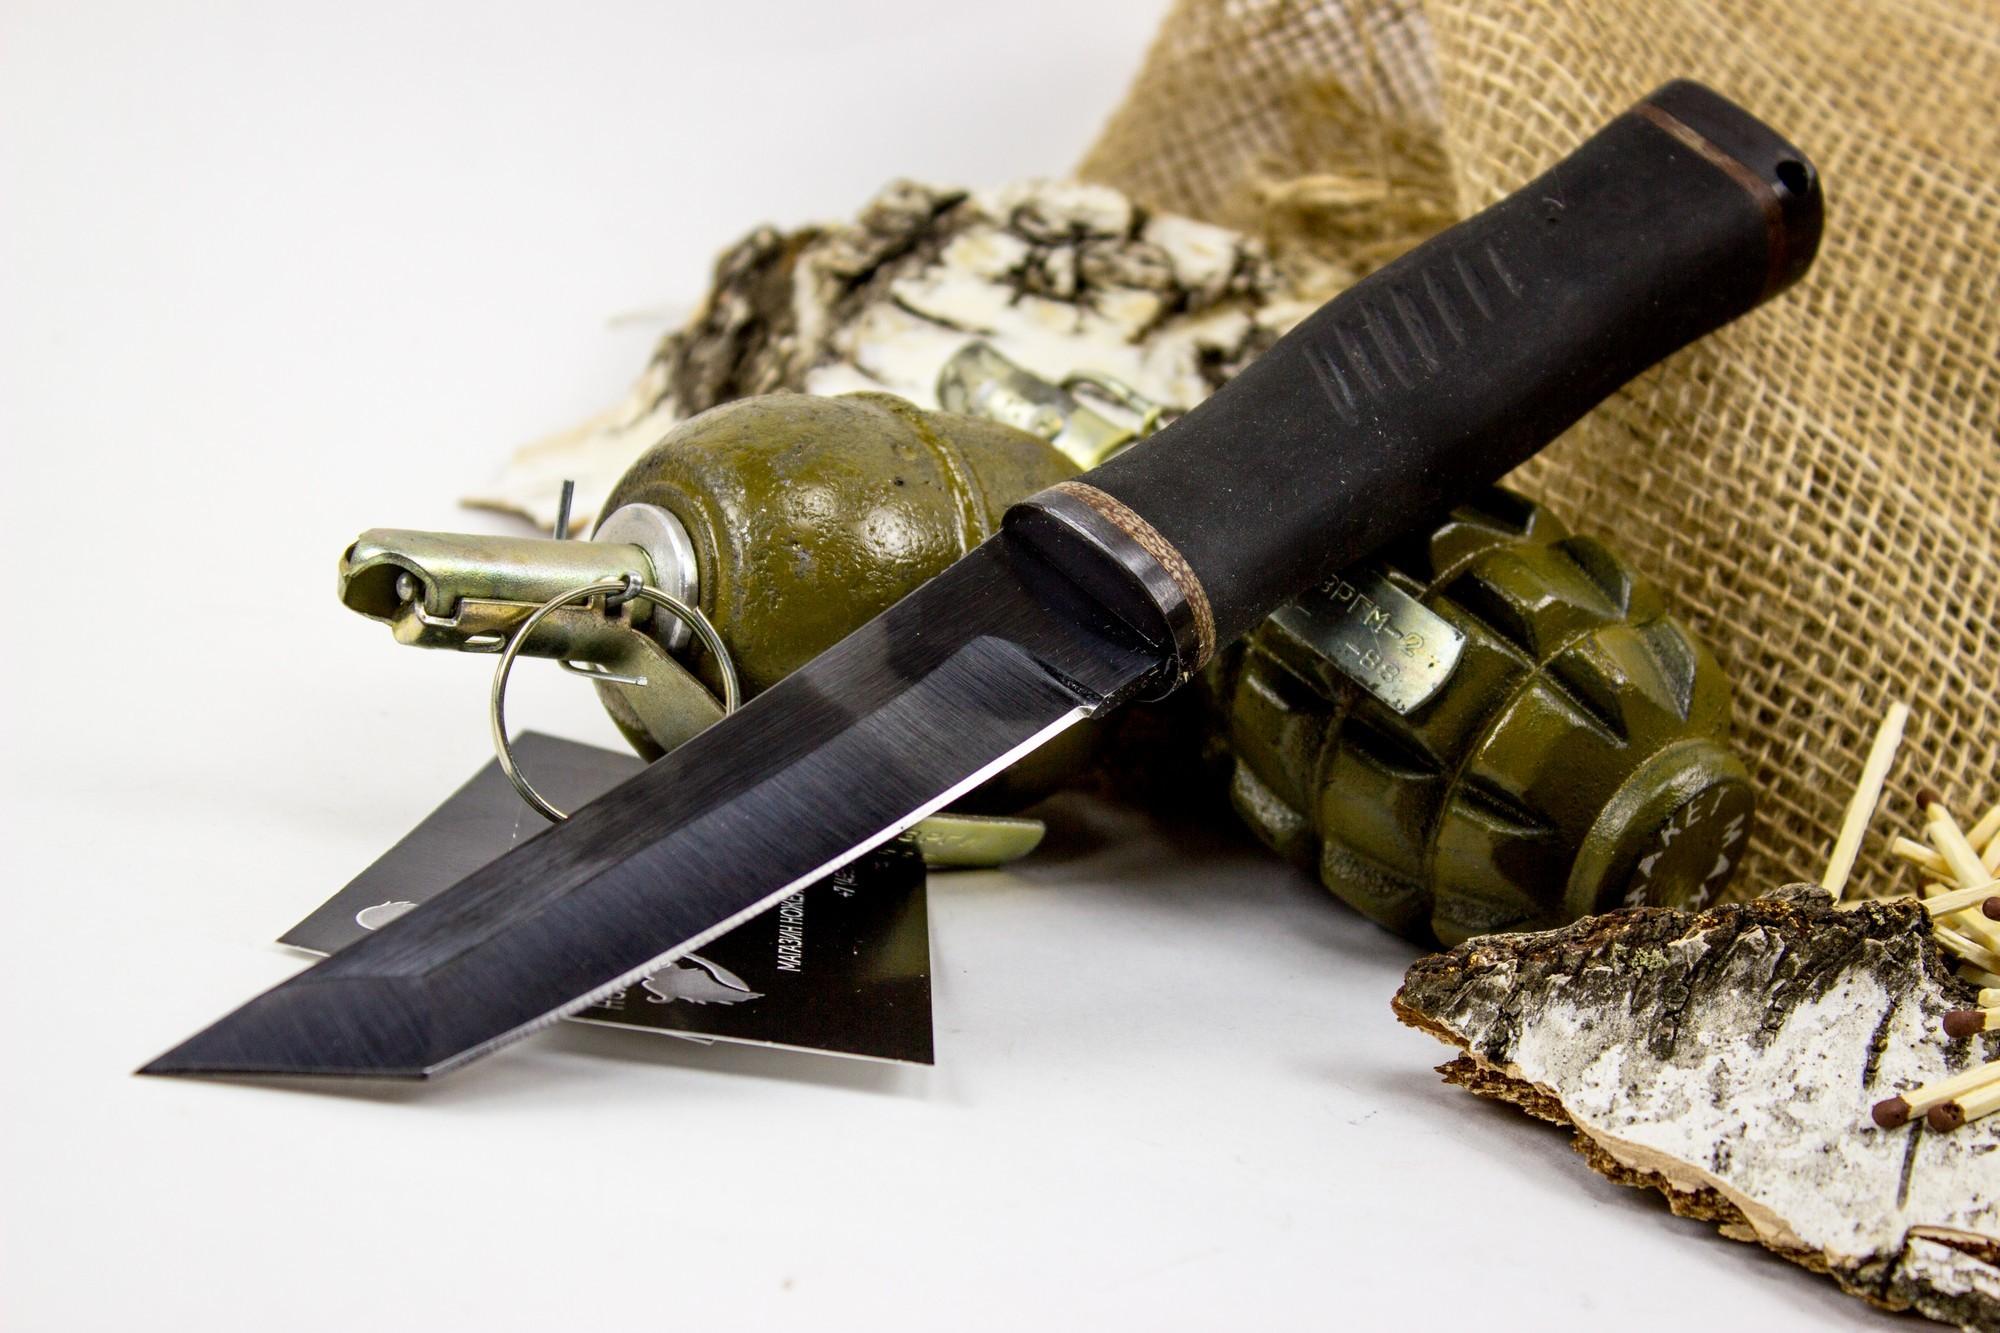 Фото 2 - Нож Кабан-1М, сталь 65Г, резина от Титов и Солдатова